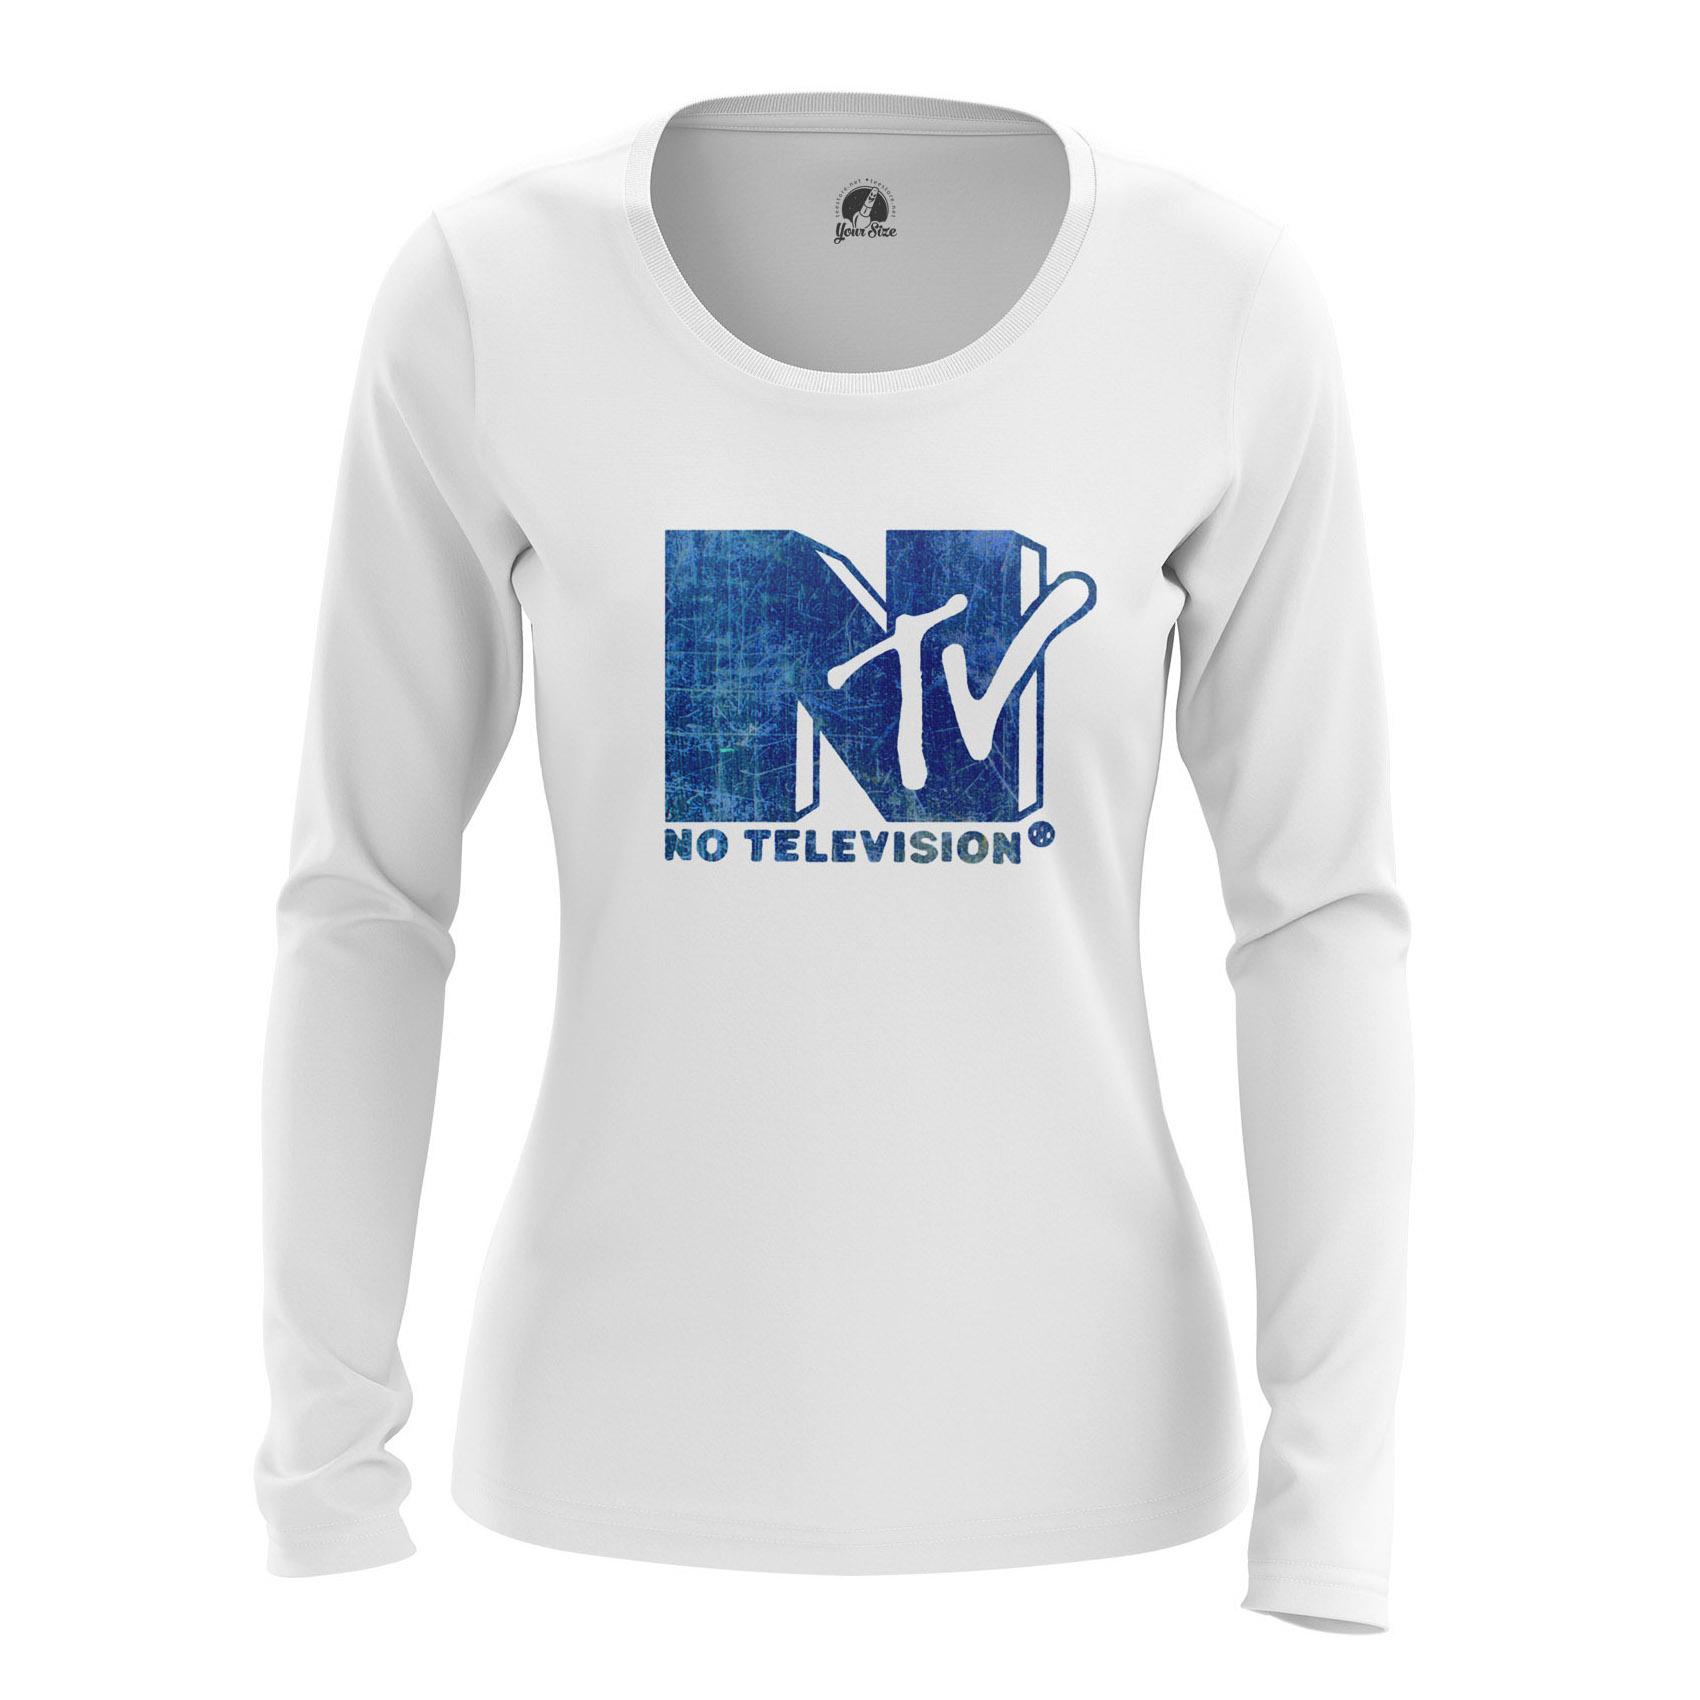 Collectibles Women'S Long Sleeve Ntv Mtv No Televison Clothes